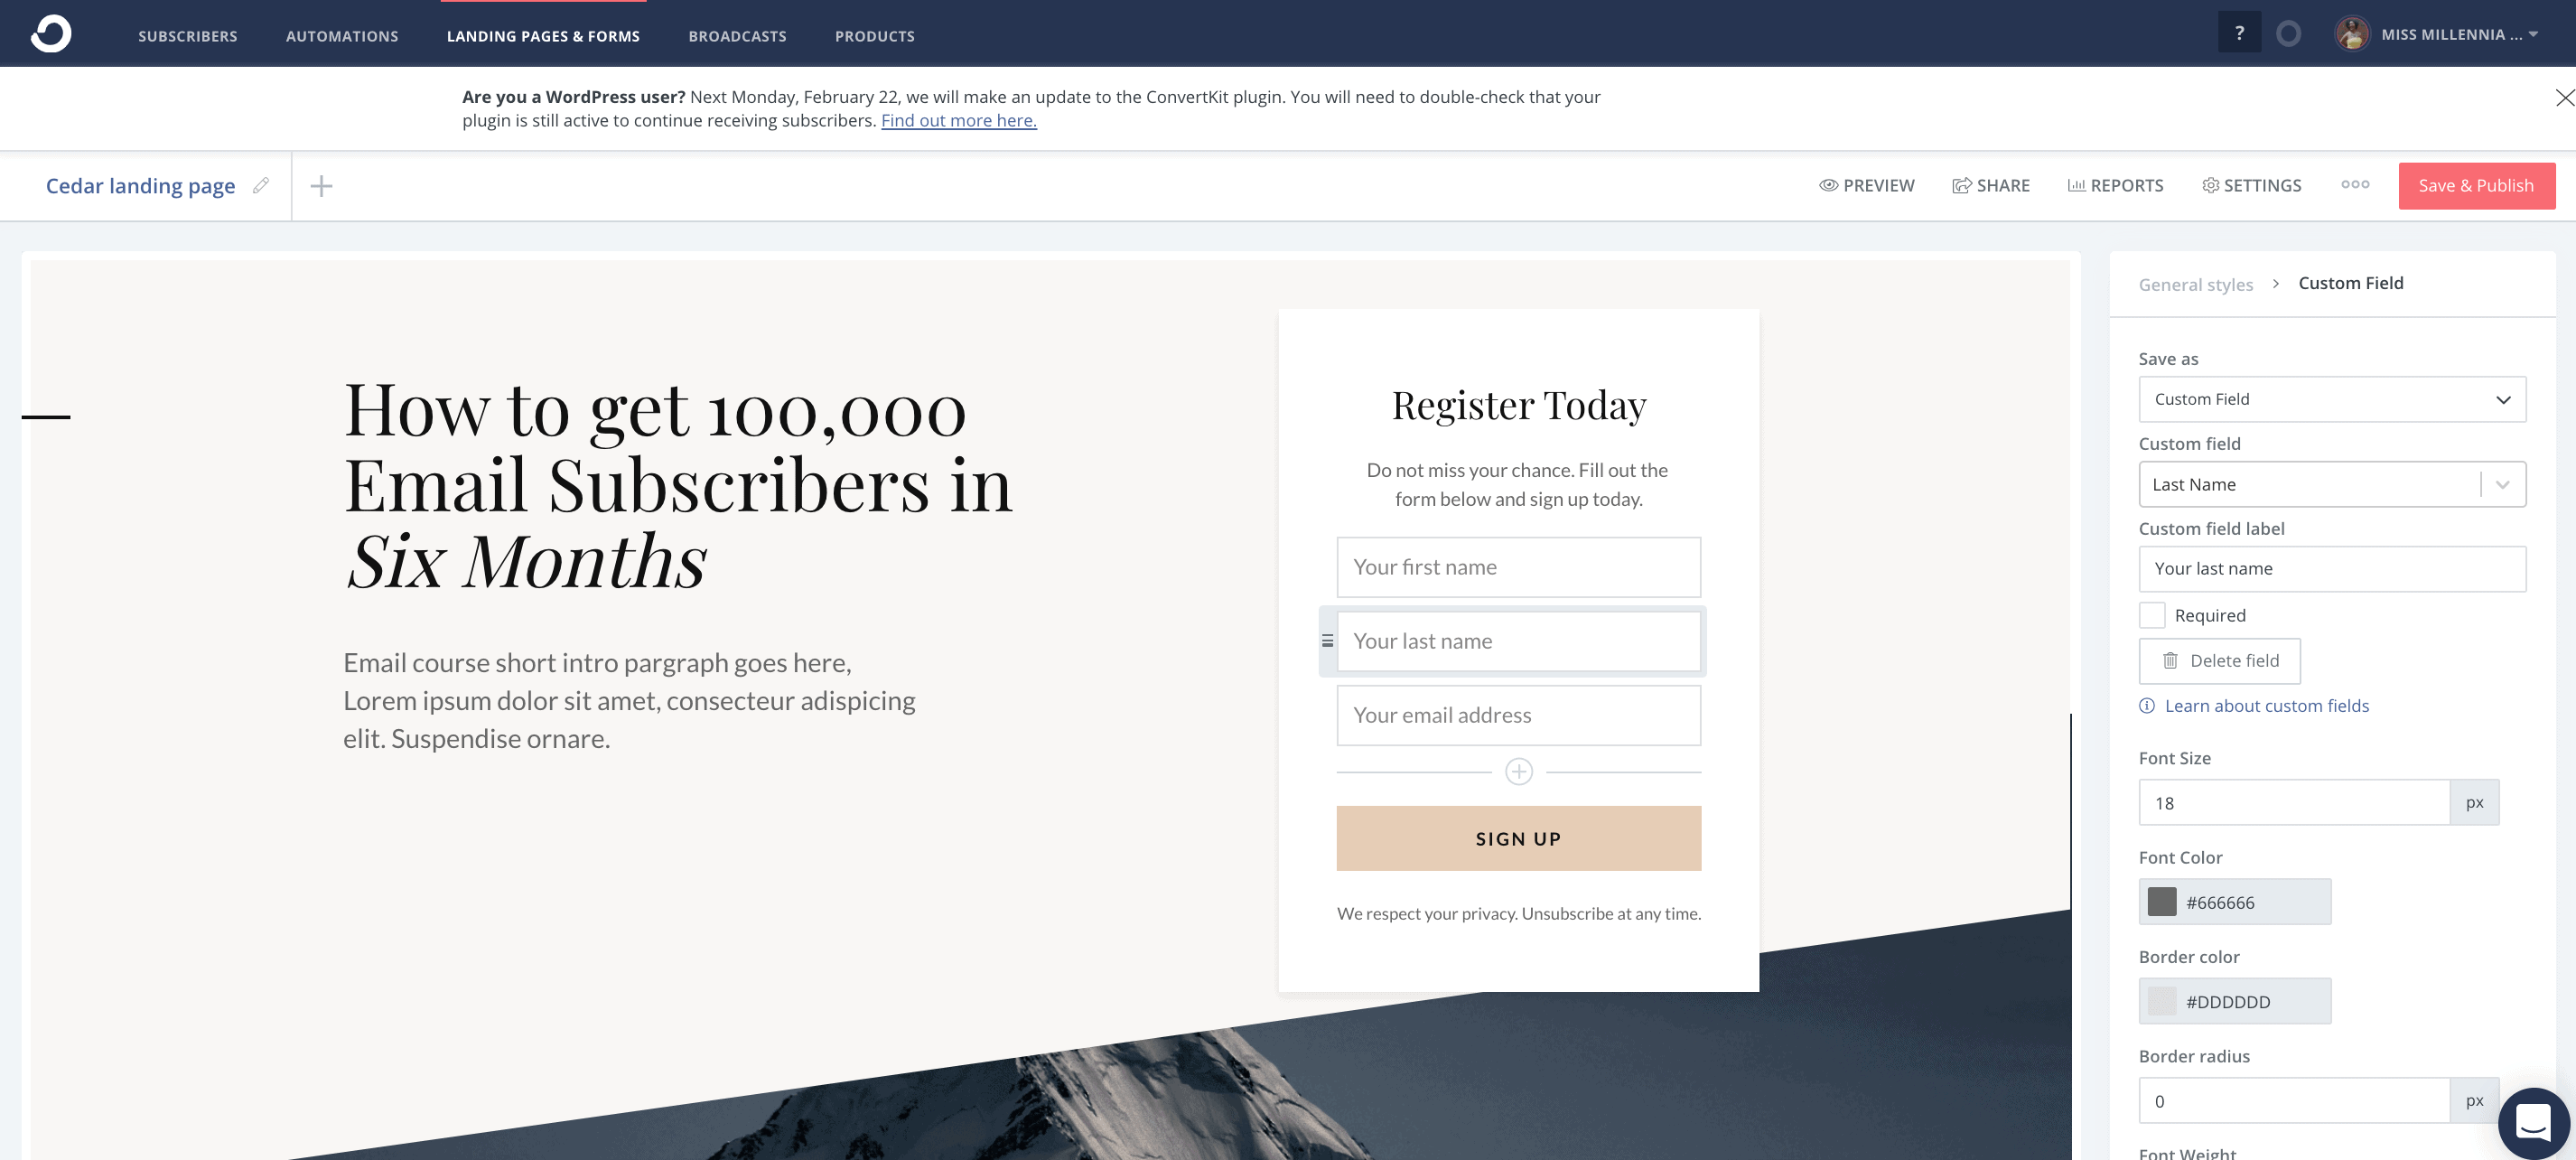 Convertkit page builder tool - ConvertKit vs LeadPages